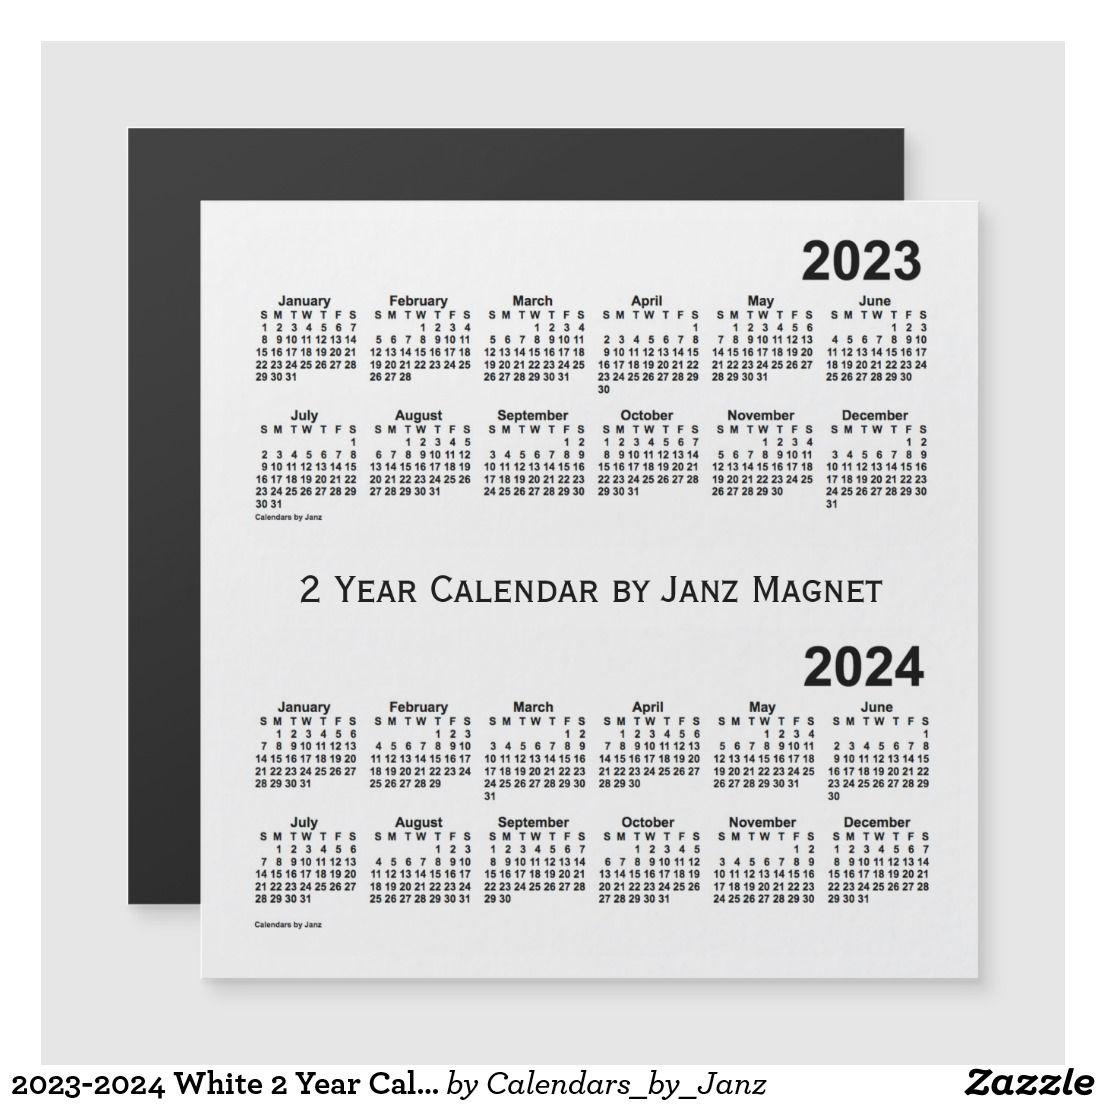 2023 2024 White 2 Year Calendar By Janz Magnet Zazzle Com